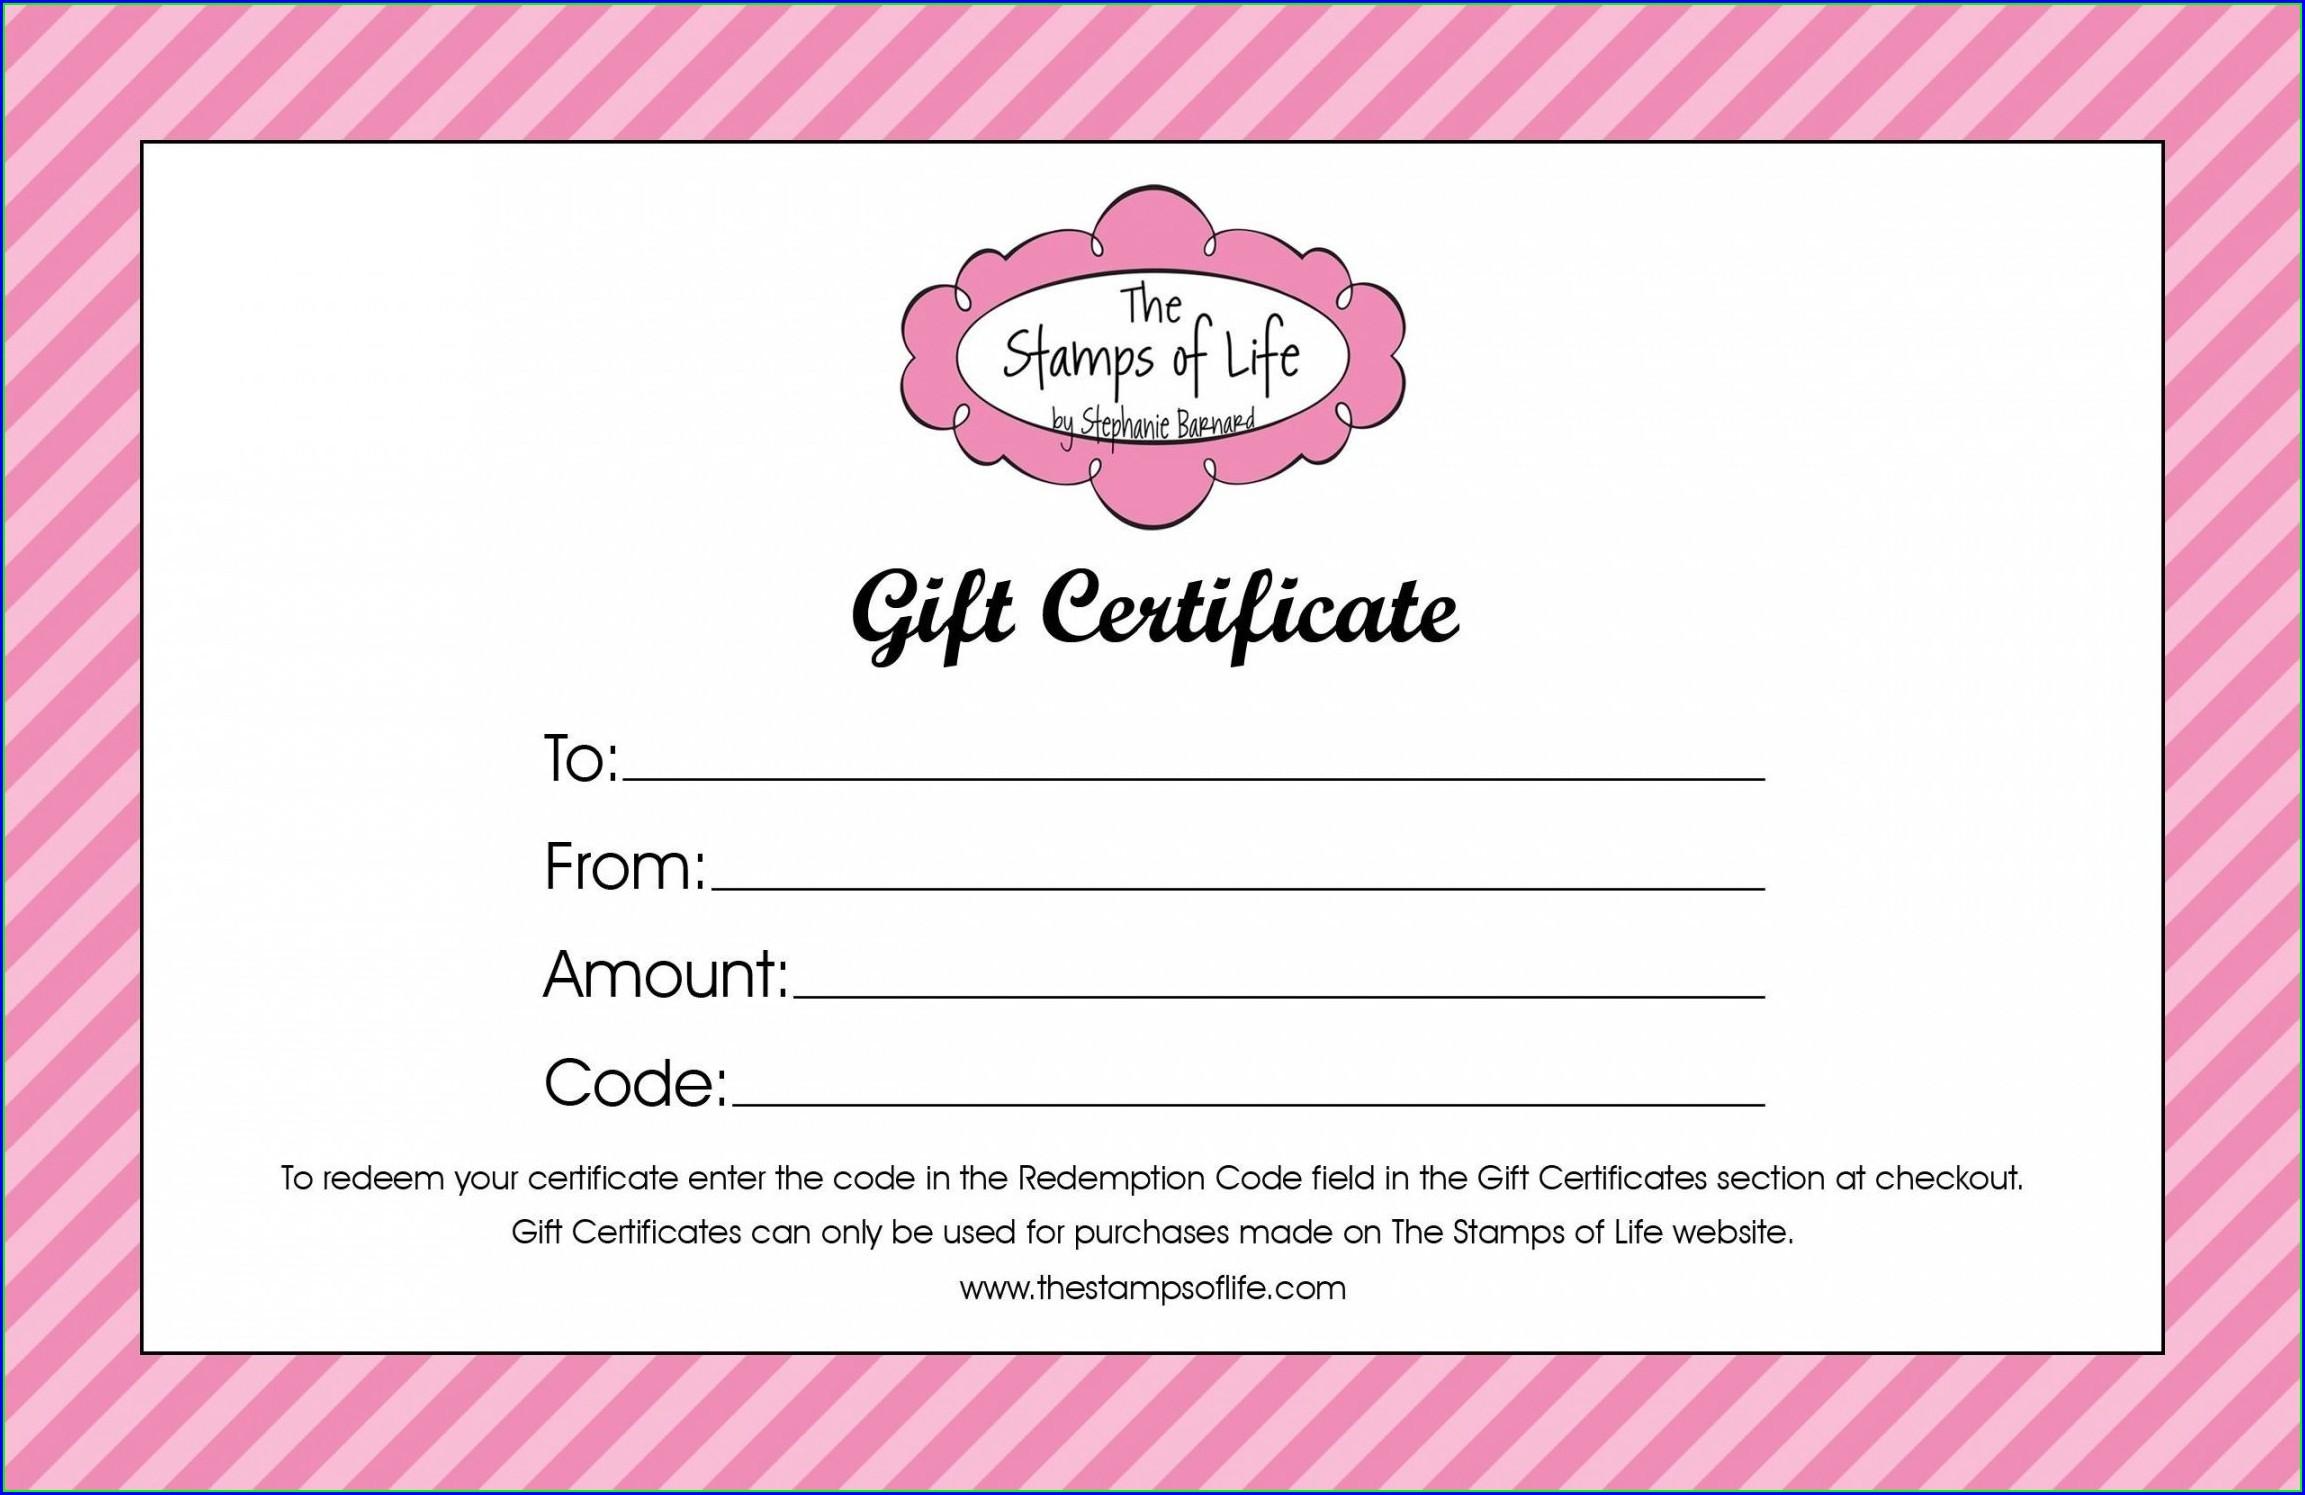 Hair Salon Gift Certificate Template Free Printable